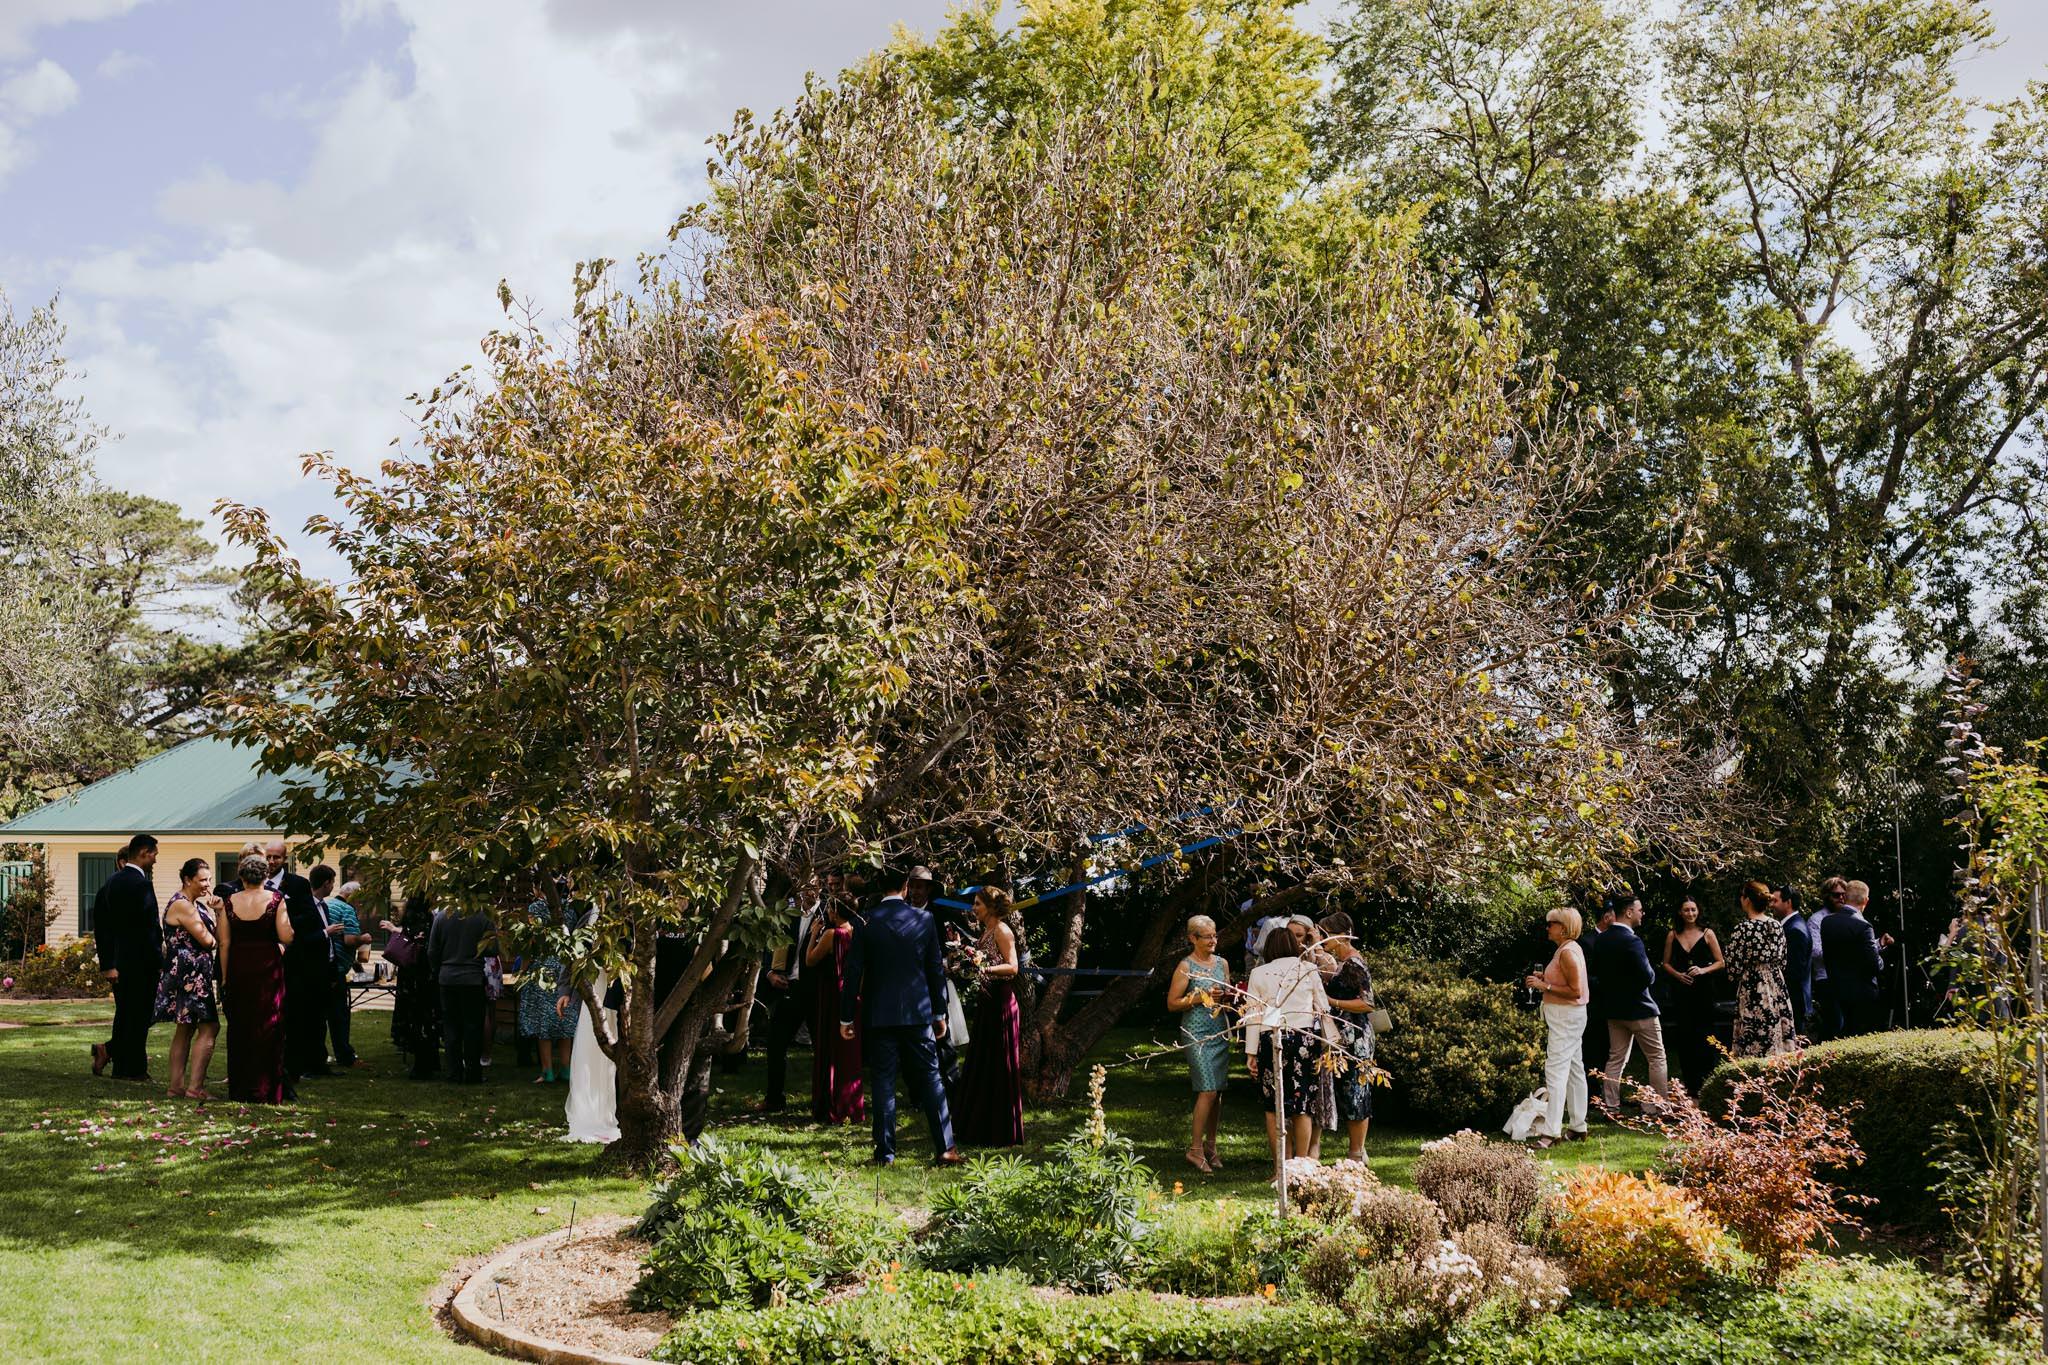 Erin Latimore Mudgee Canberra Wedding Photographer ROSEBANK GUESTHOUSE OLD THEATRE TONIC MILLTHORPE_370.JPG